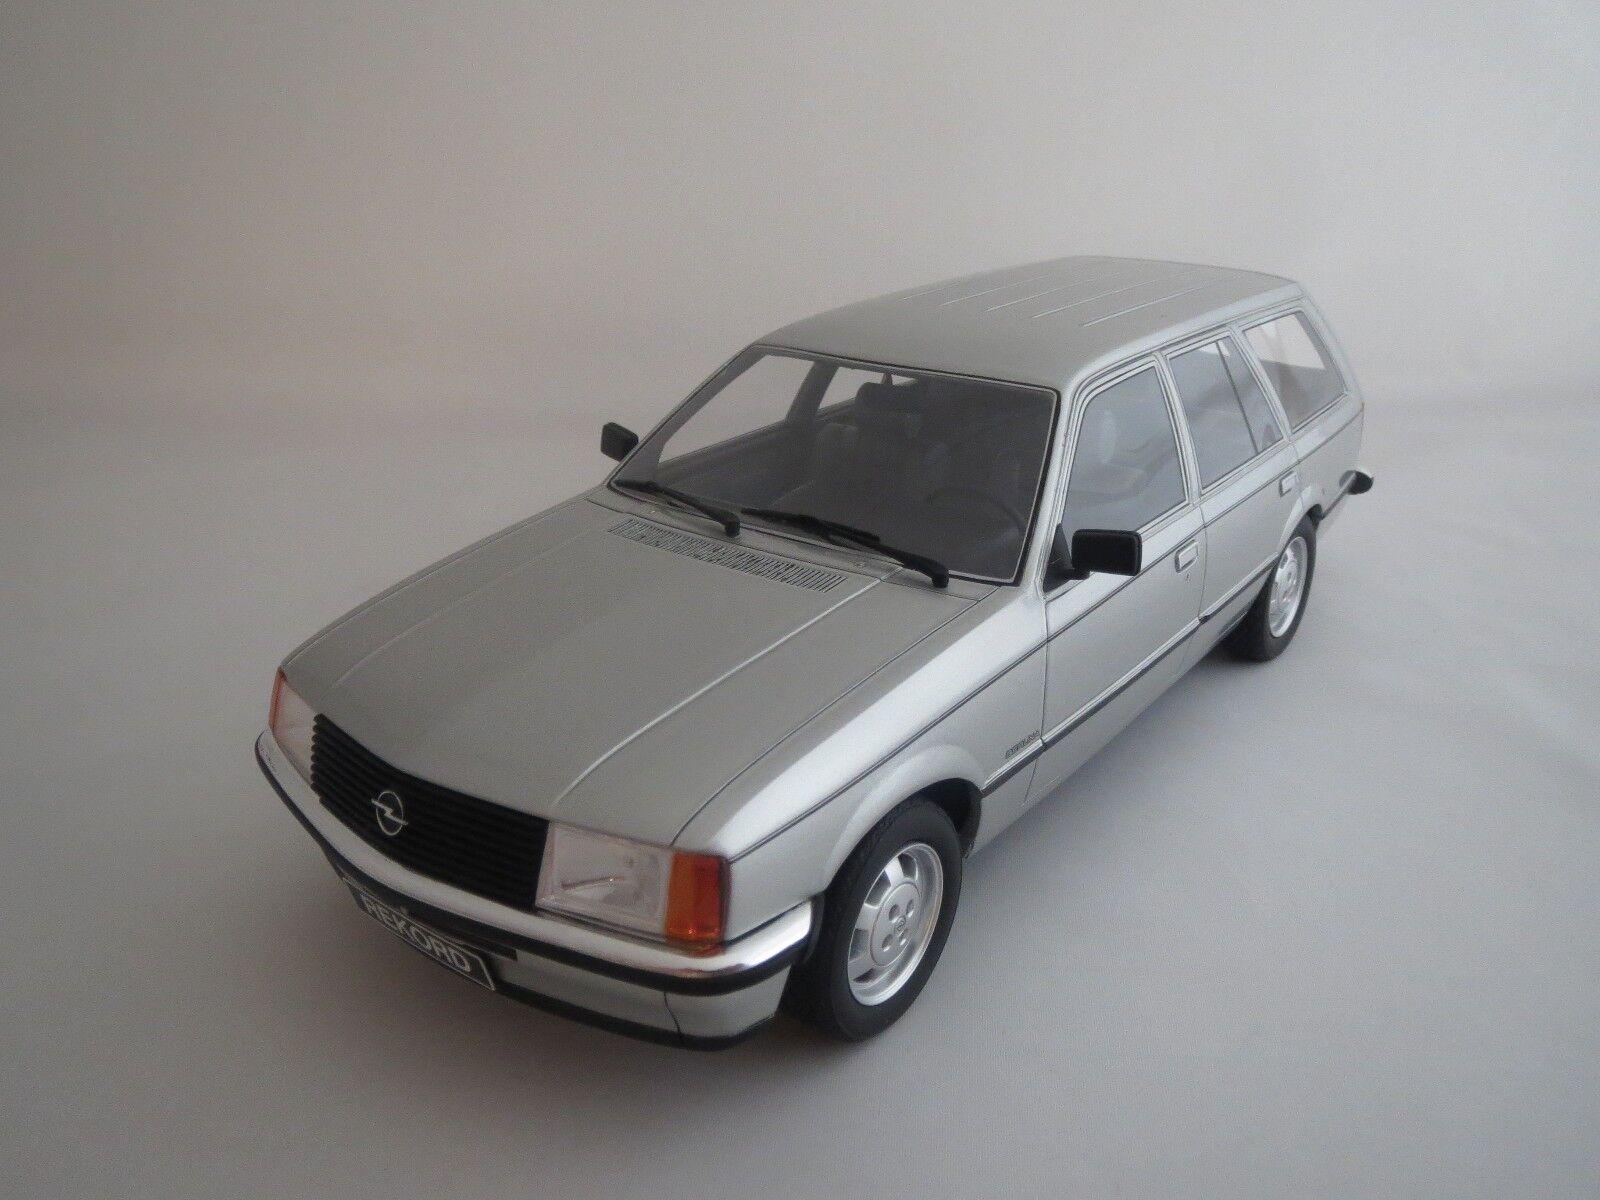 BoS Opel Record E Caravan  1981  (argent) 1 18 sans emballage